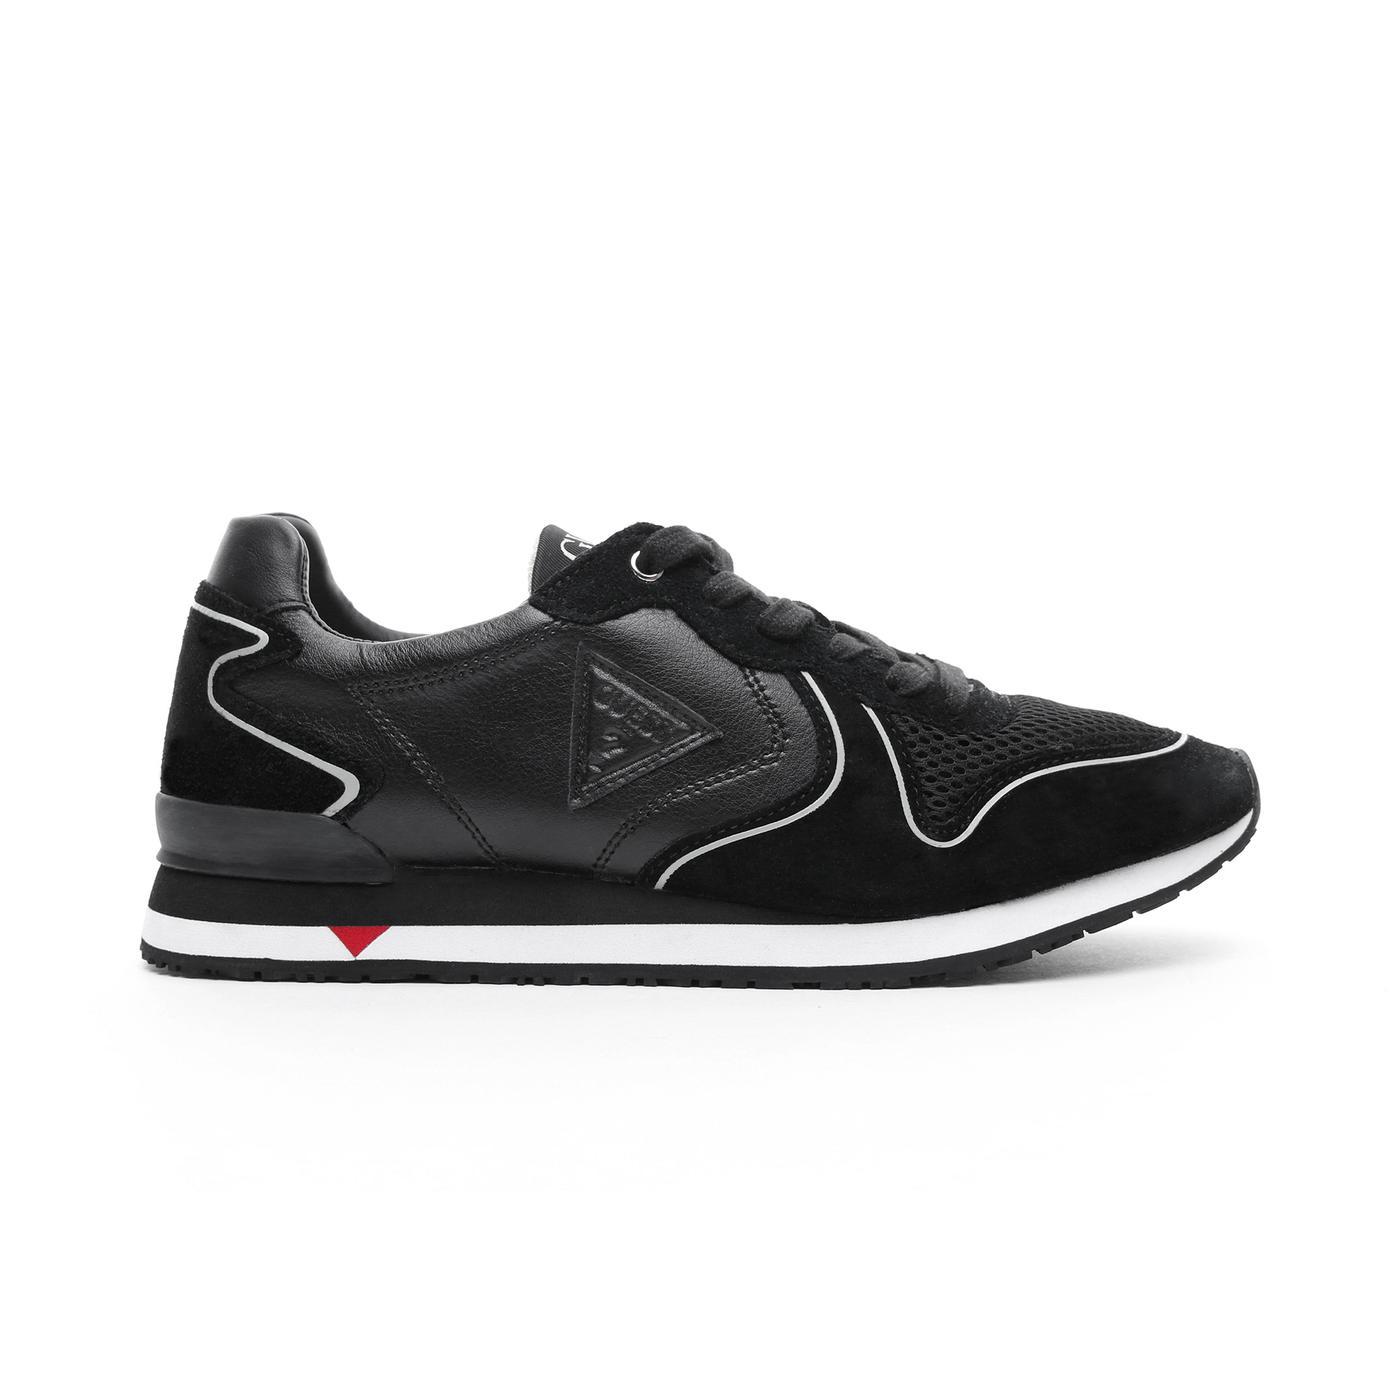 Guess New Glorym Erkek Siyah Spor Ayakkabı